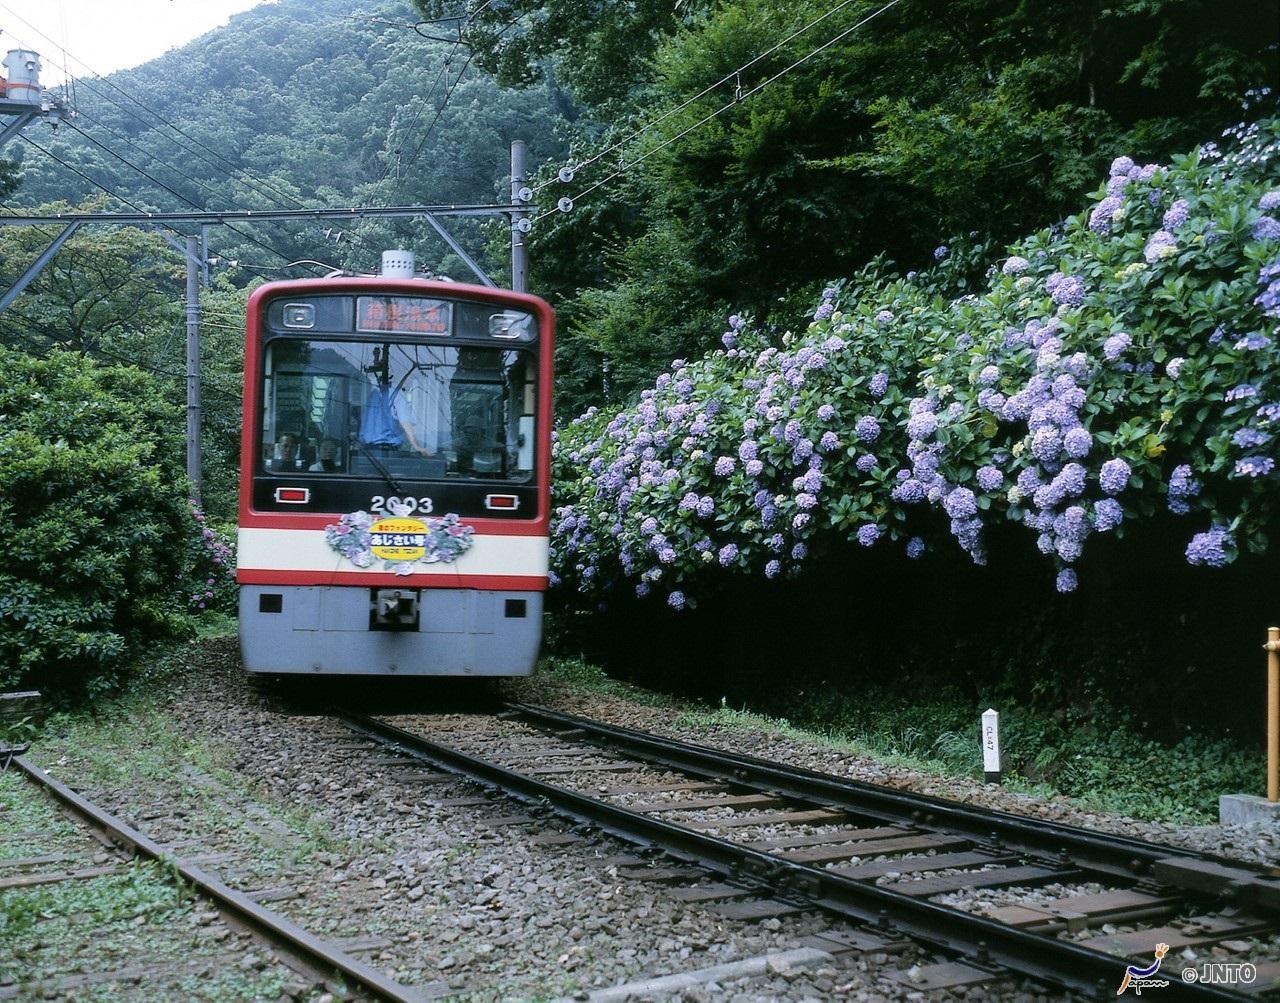 Door2Door transfer within the city. Hakone city ( Cherry Tomato )